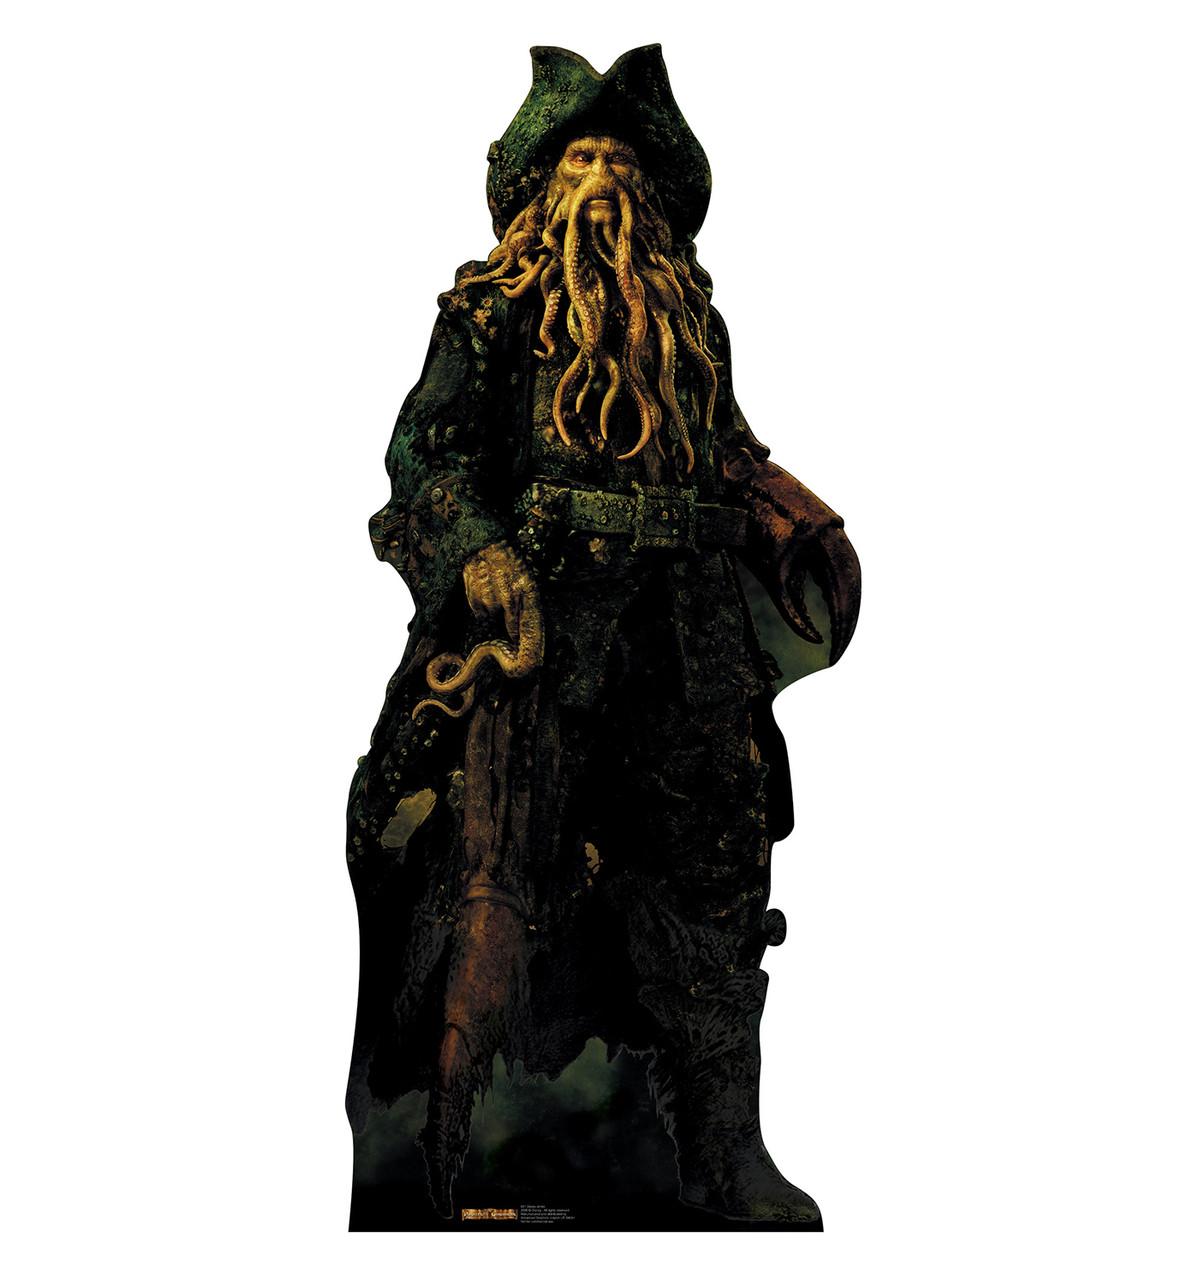 Life-size Davy Jones Cardboard Standup |Cardboard Cutout